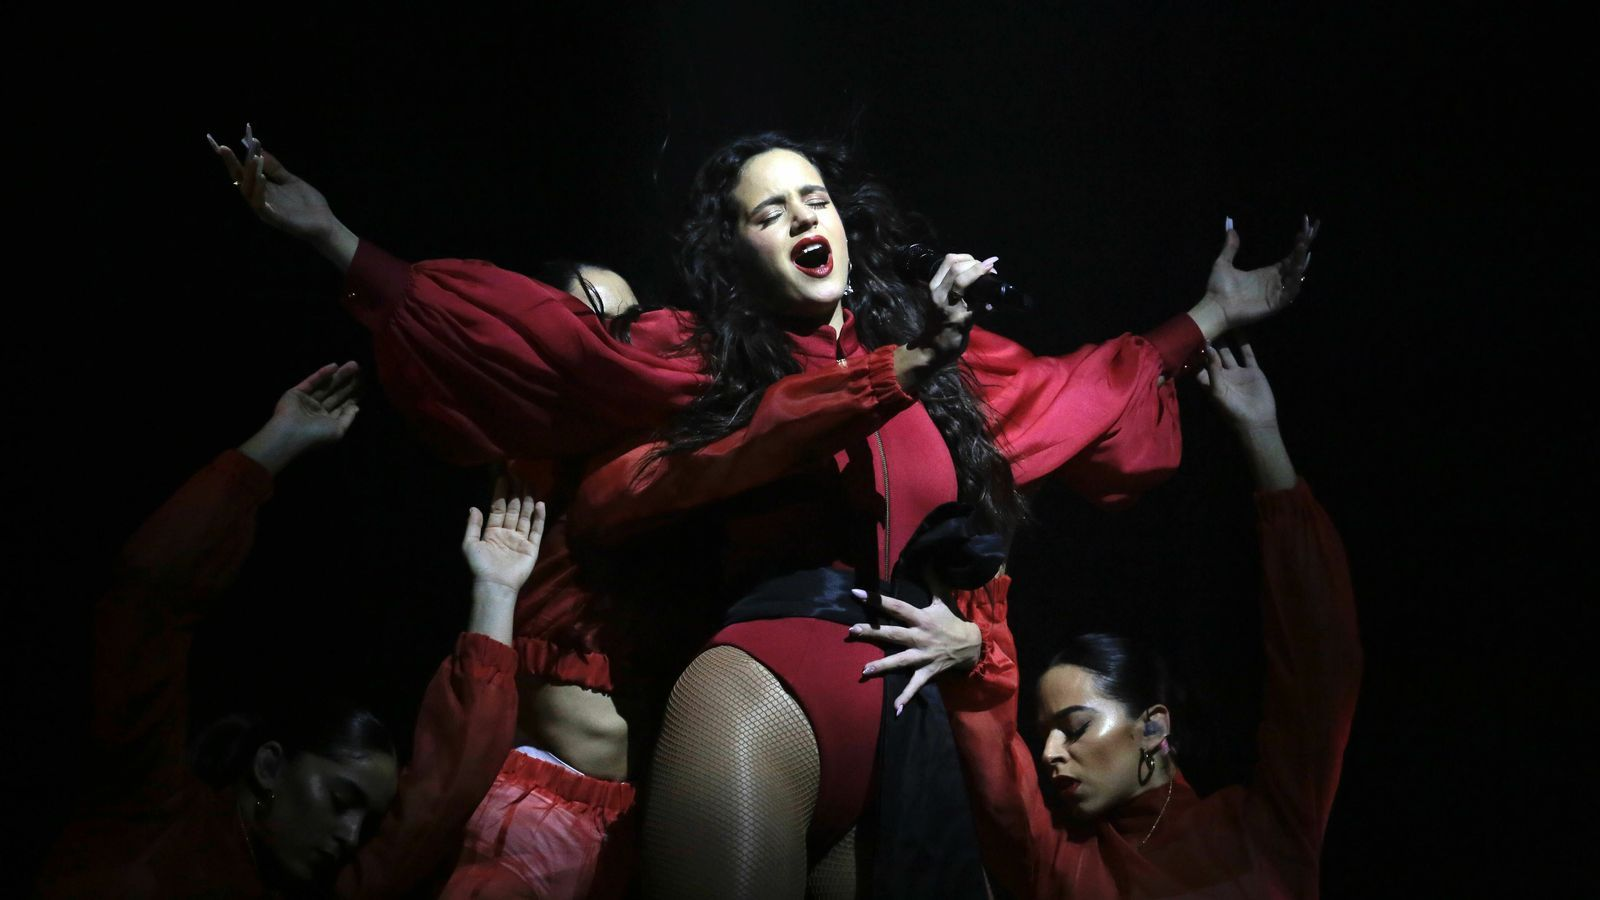 Rosalía during her concert at the Palau Sant Jordi in Barcelona